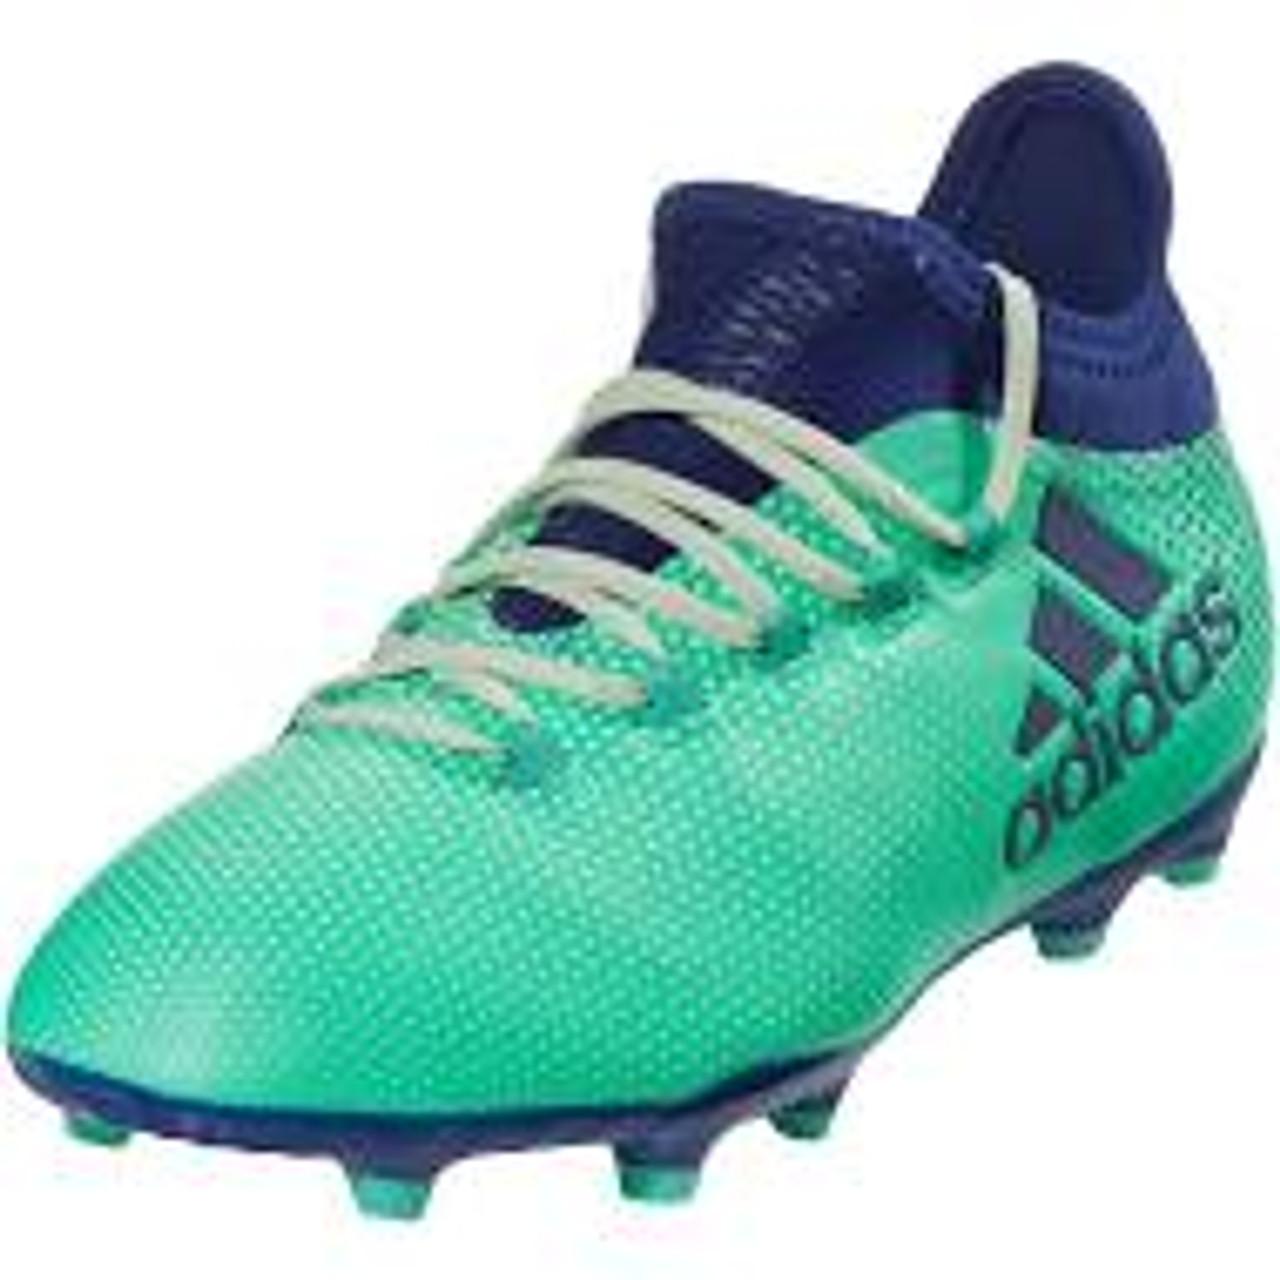 ADIDAS X 17.1 FG Junior Soccer Cleats